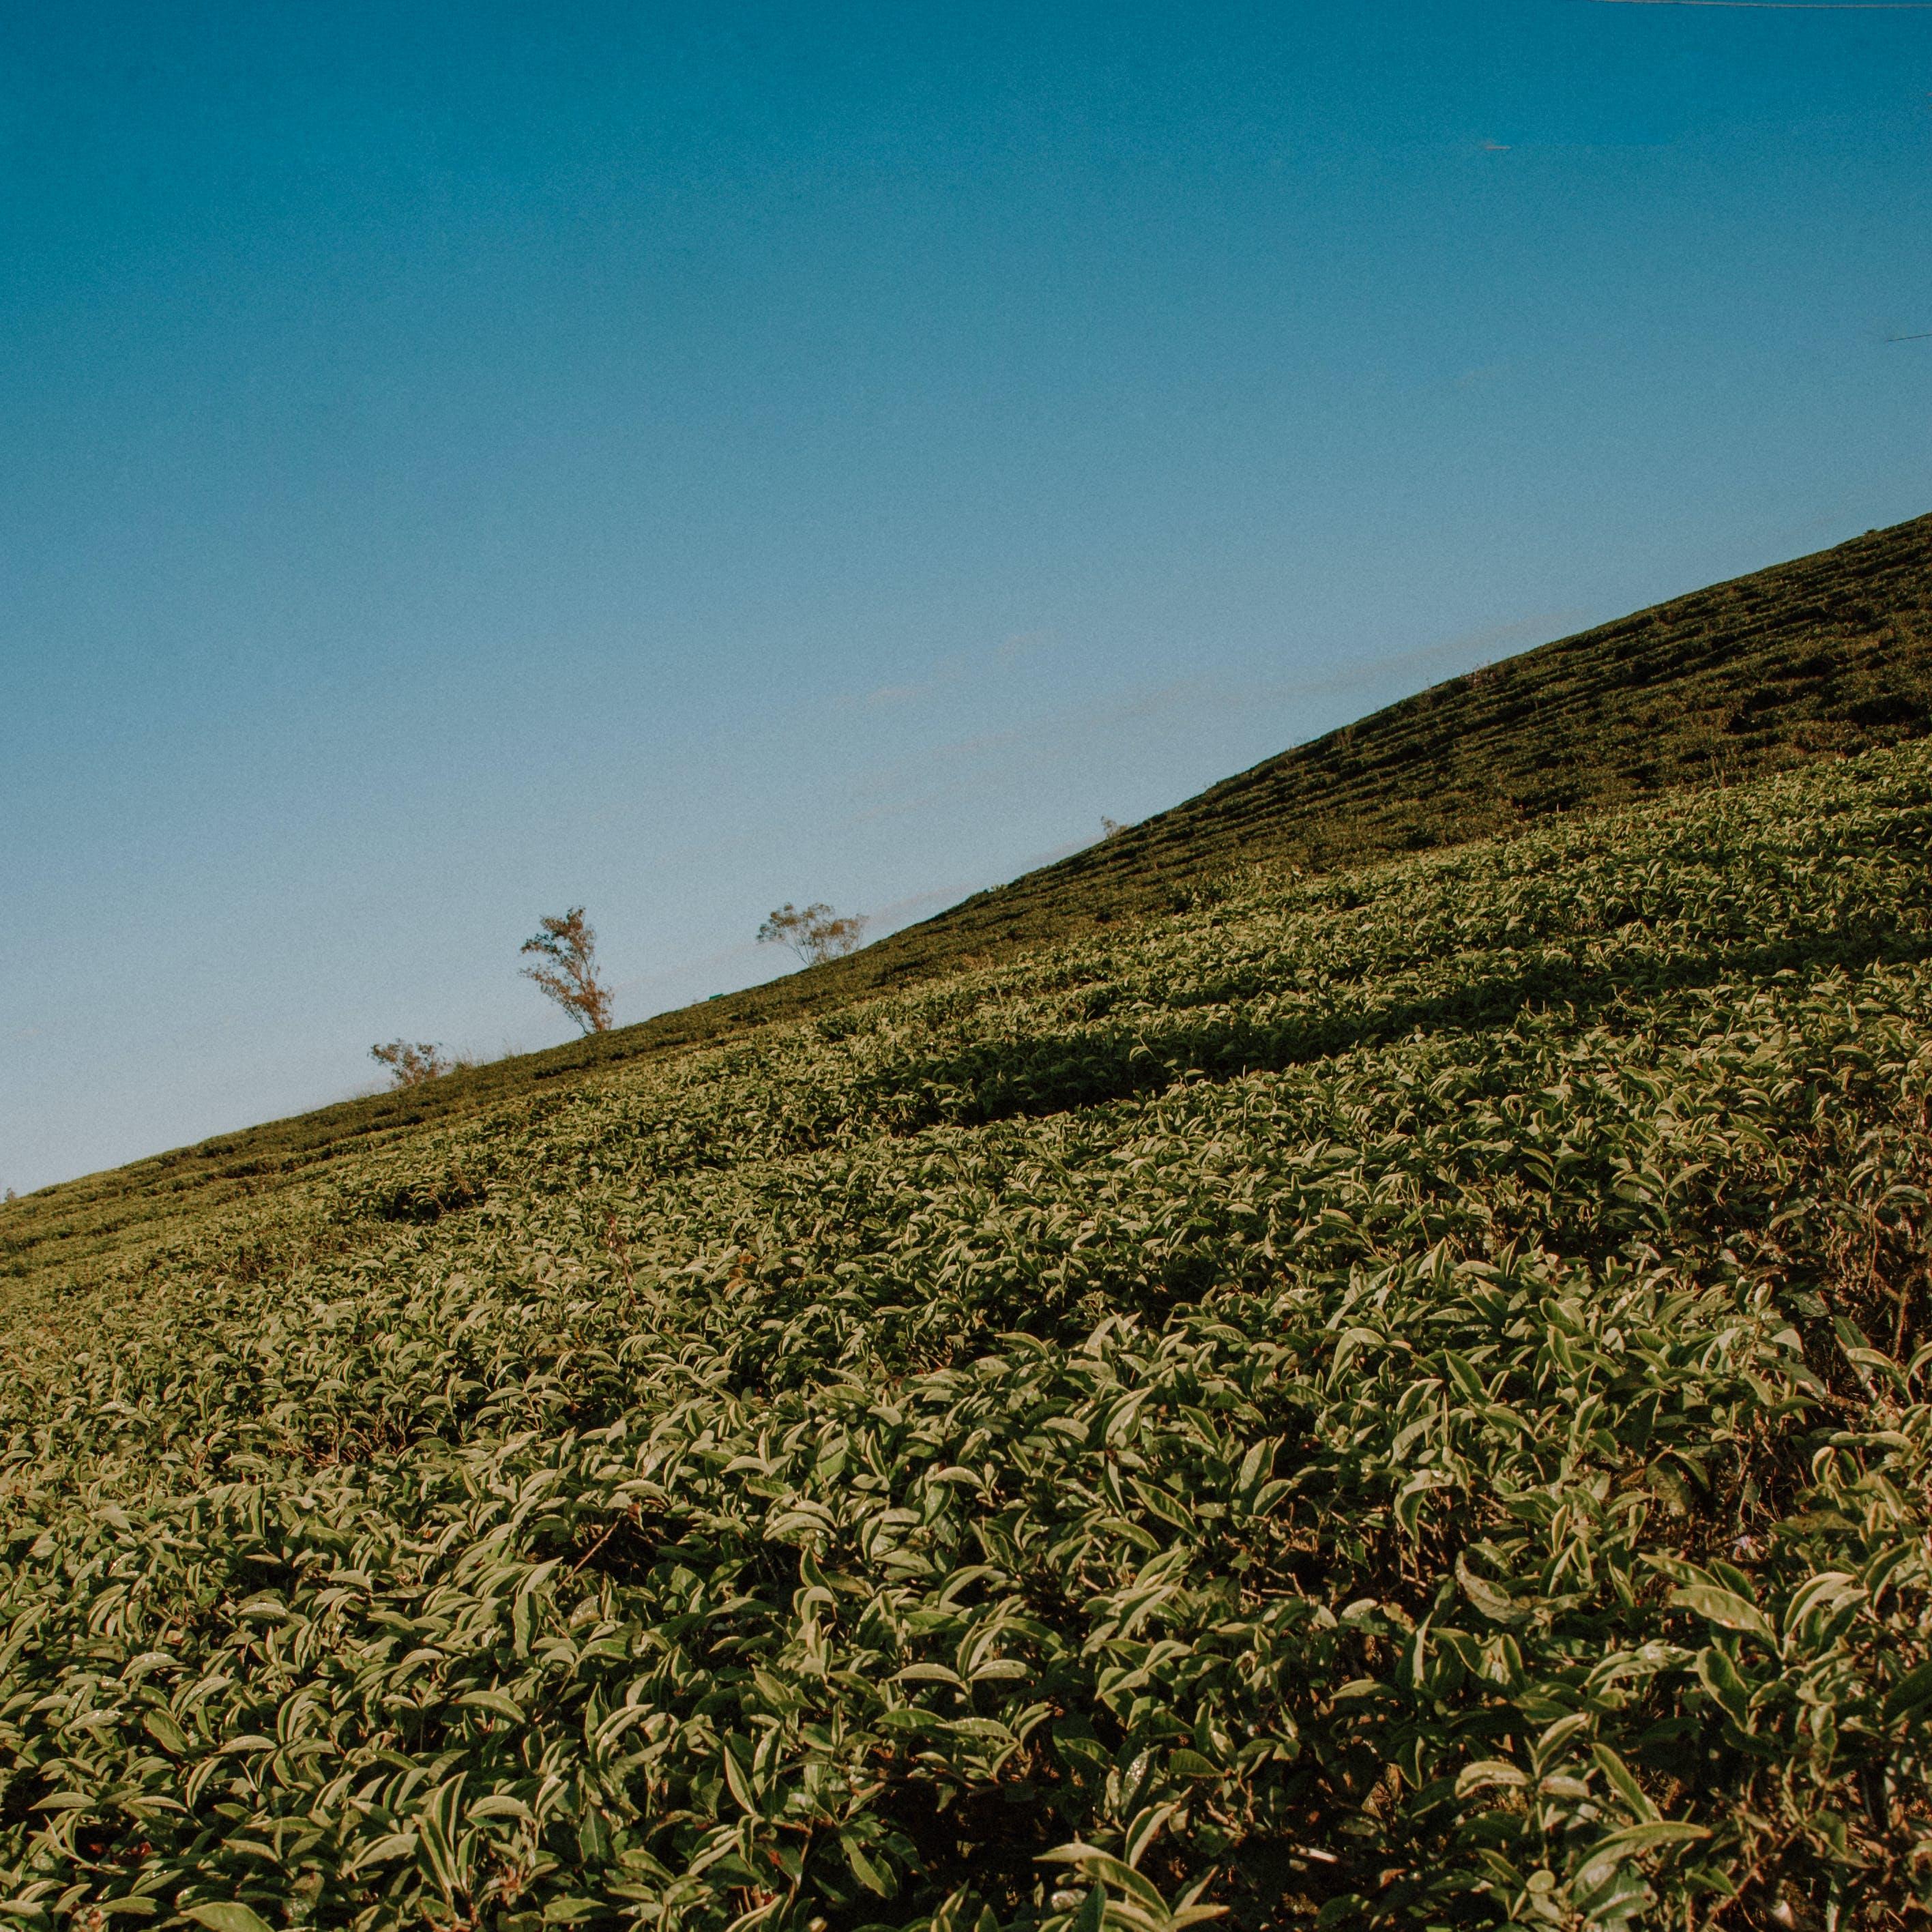 Kostenloses Stock Foto zu landschaft, natur, himmel, feld